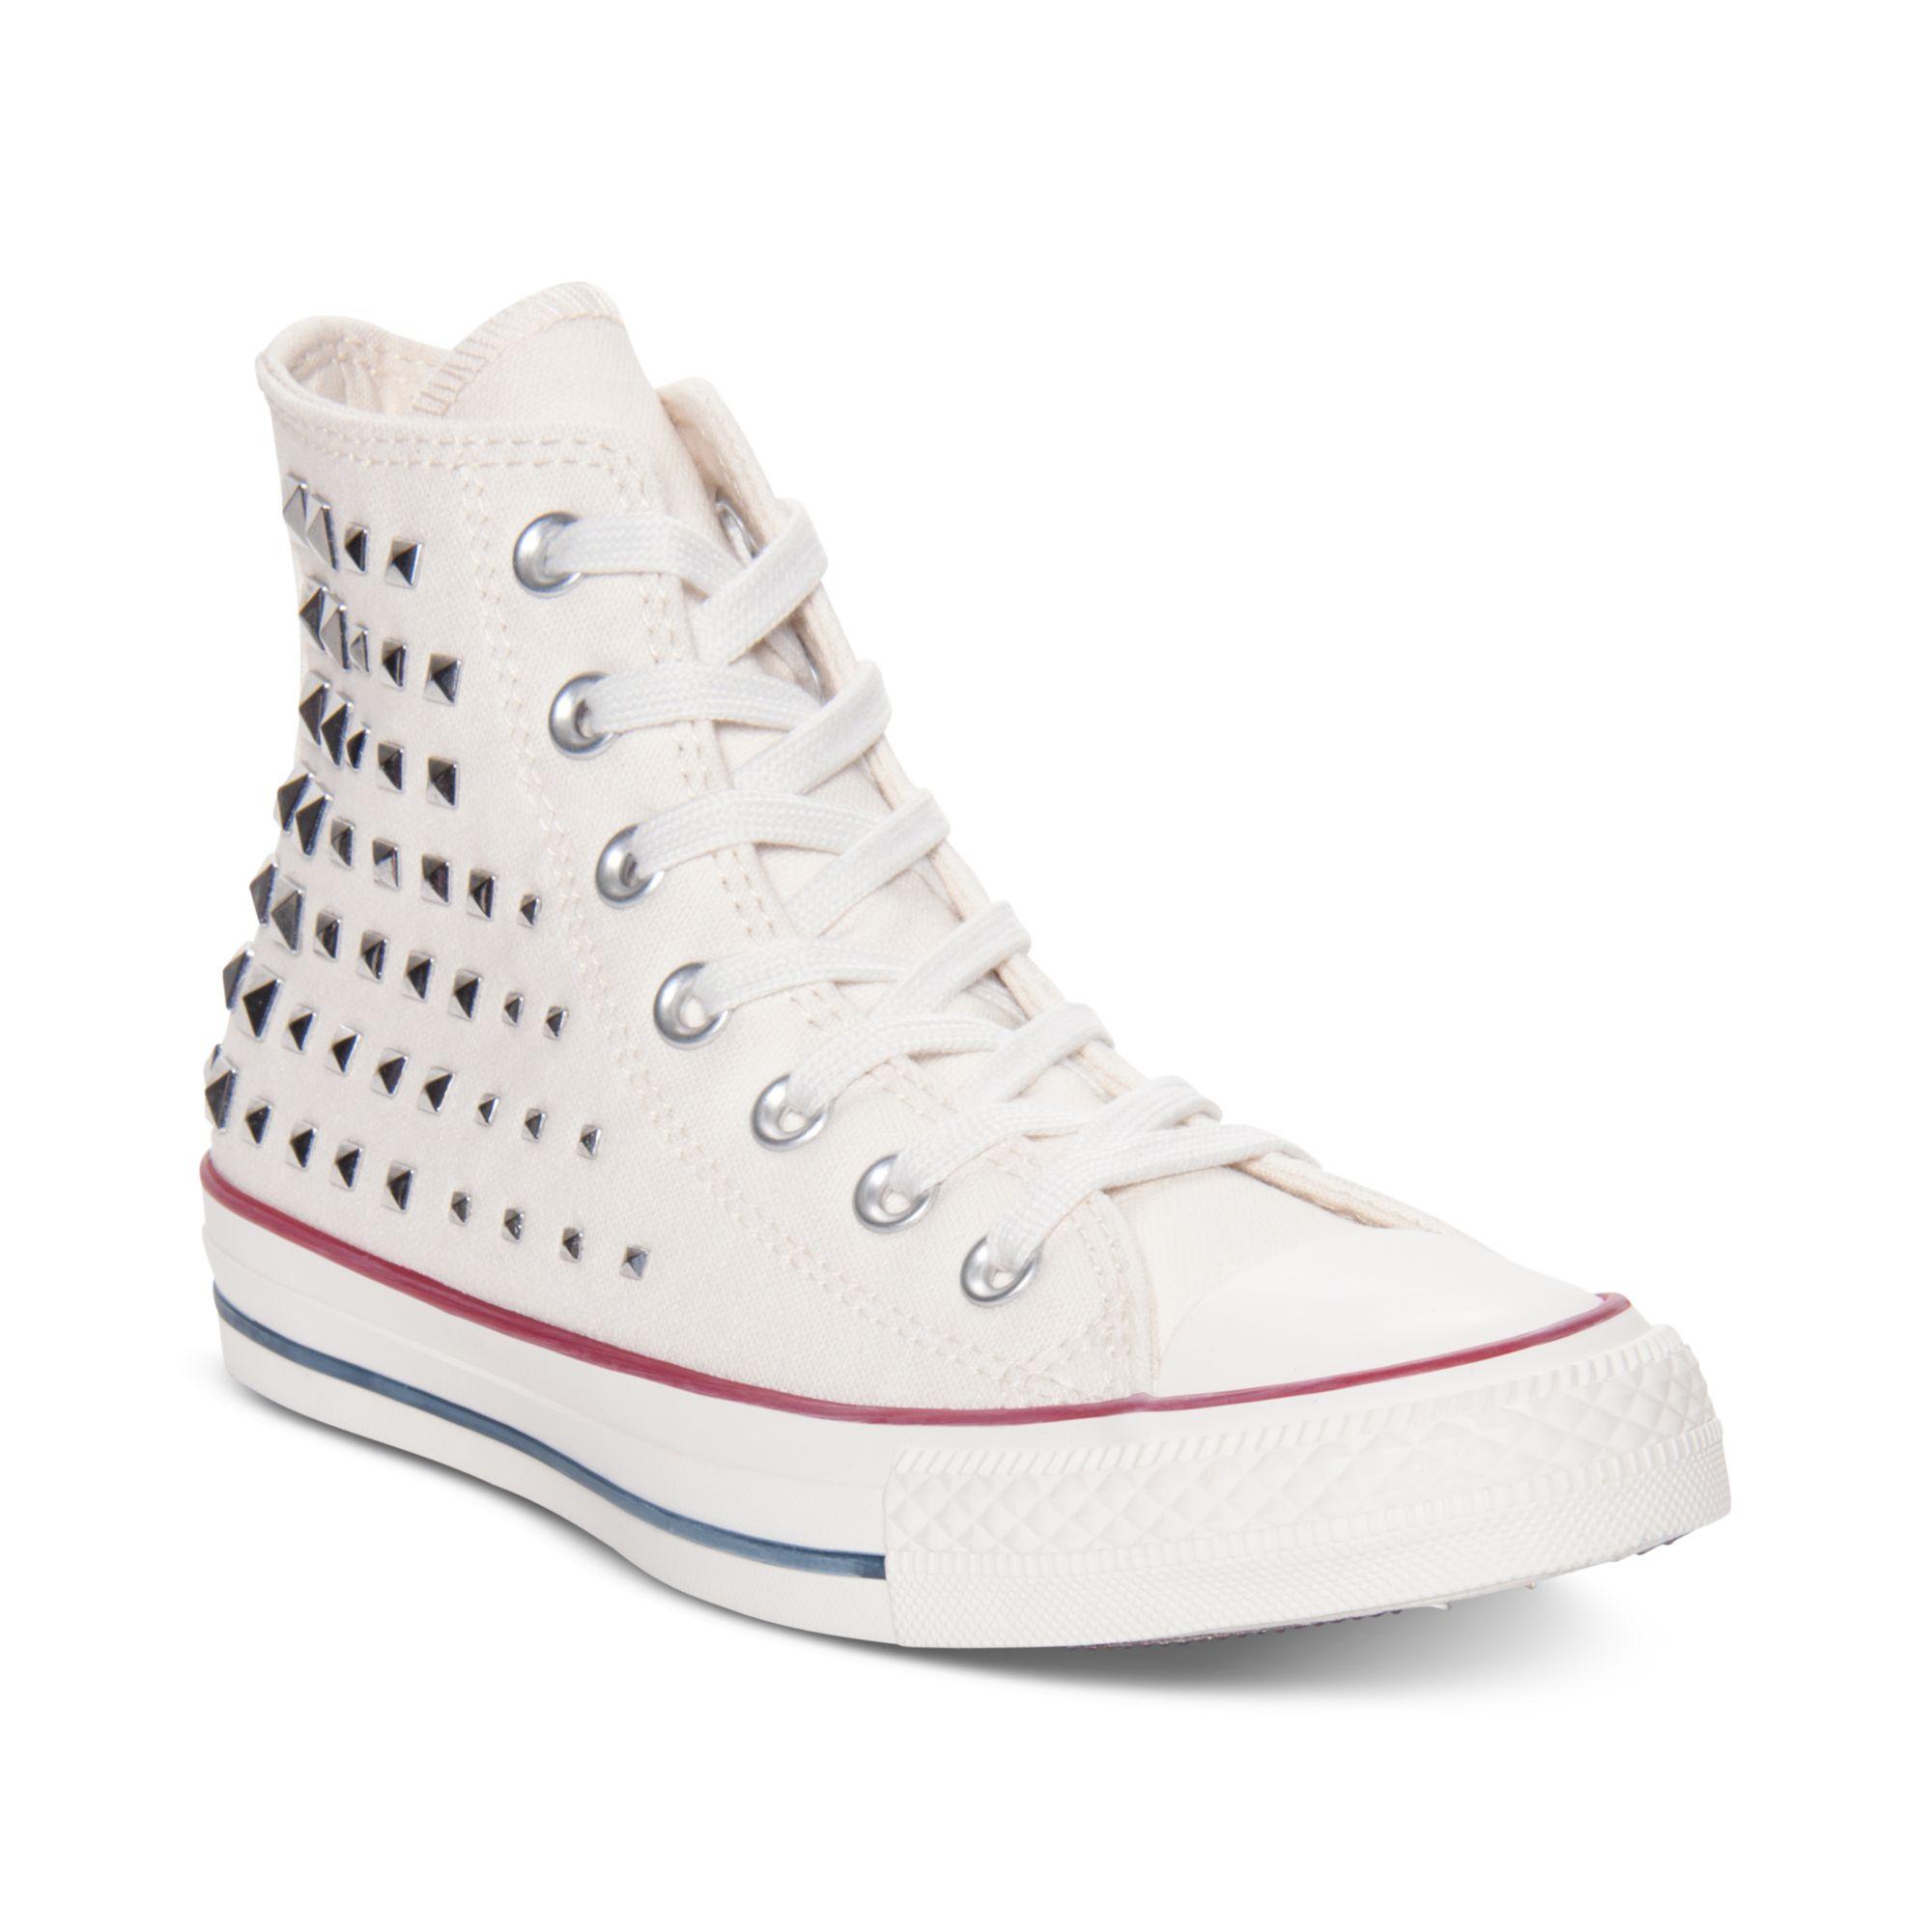 Converse Chuck Taylor Collar Studs White-White